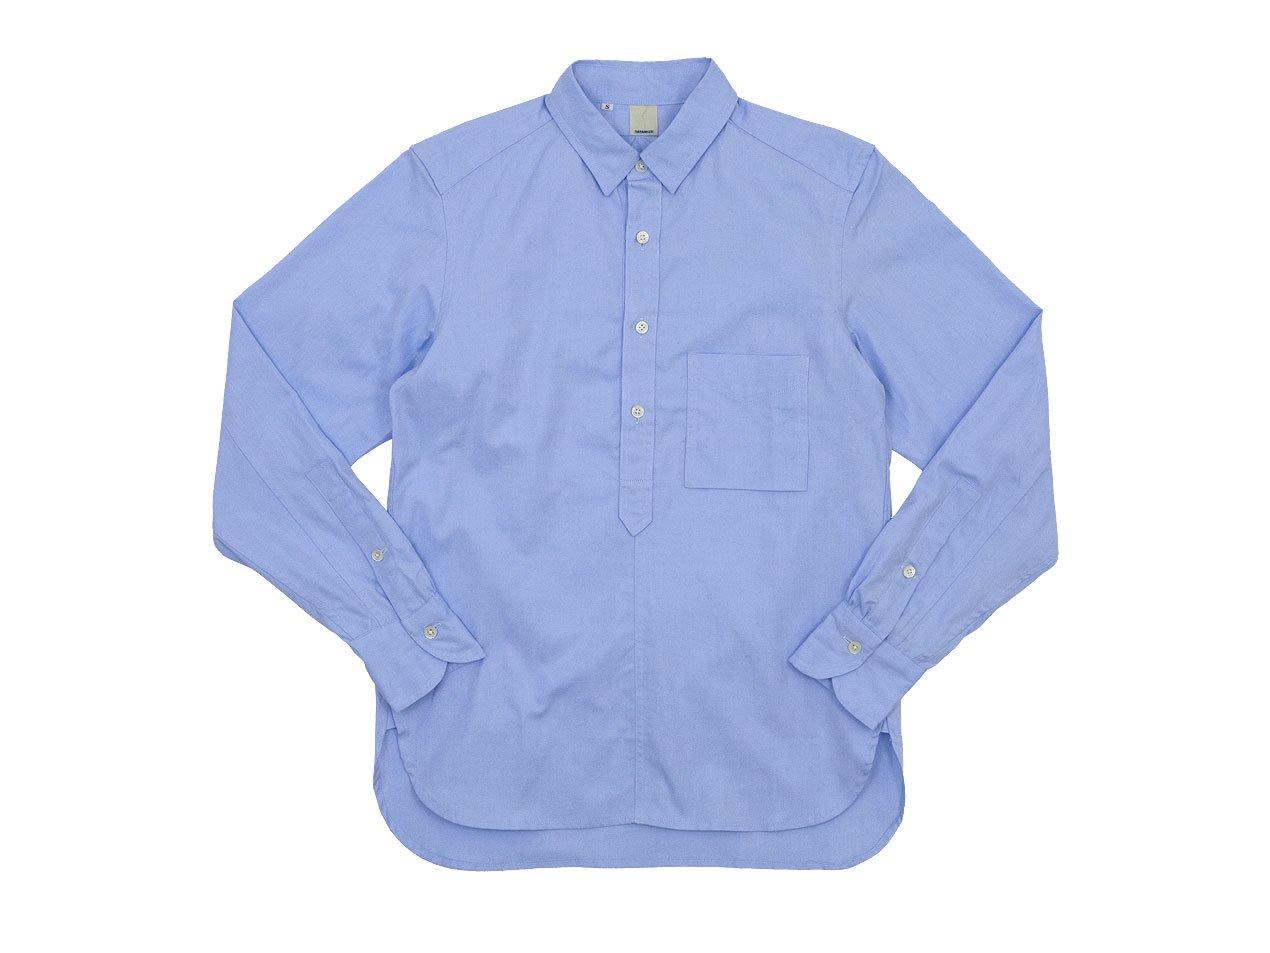 TATAMIZE P/O SHIRTS BLUE